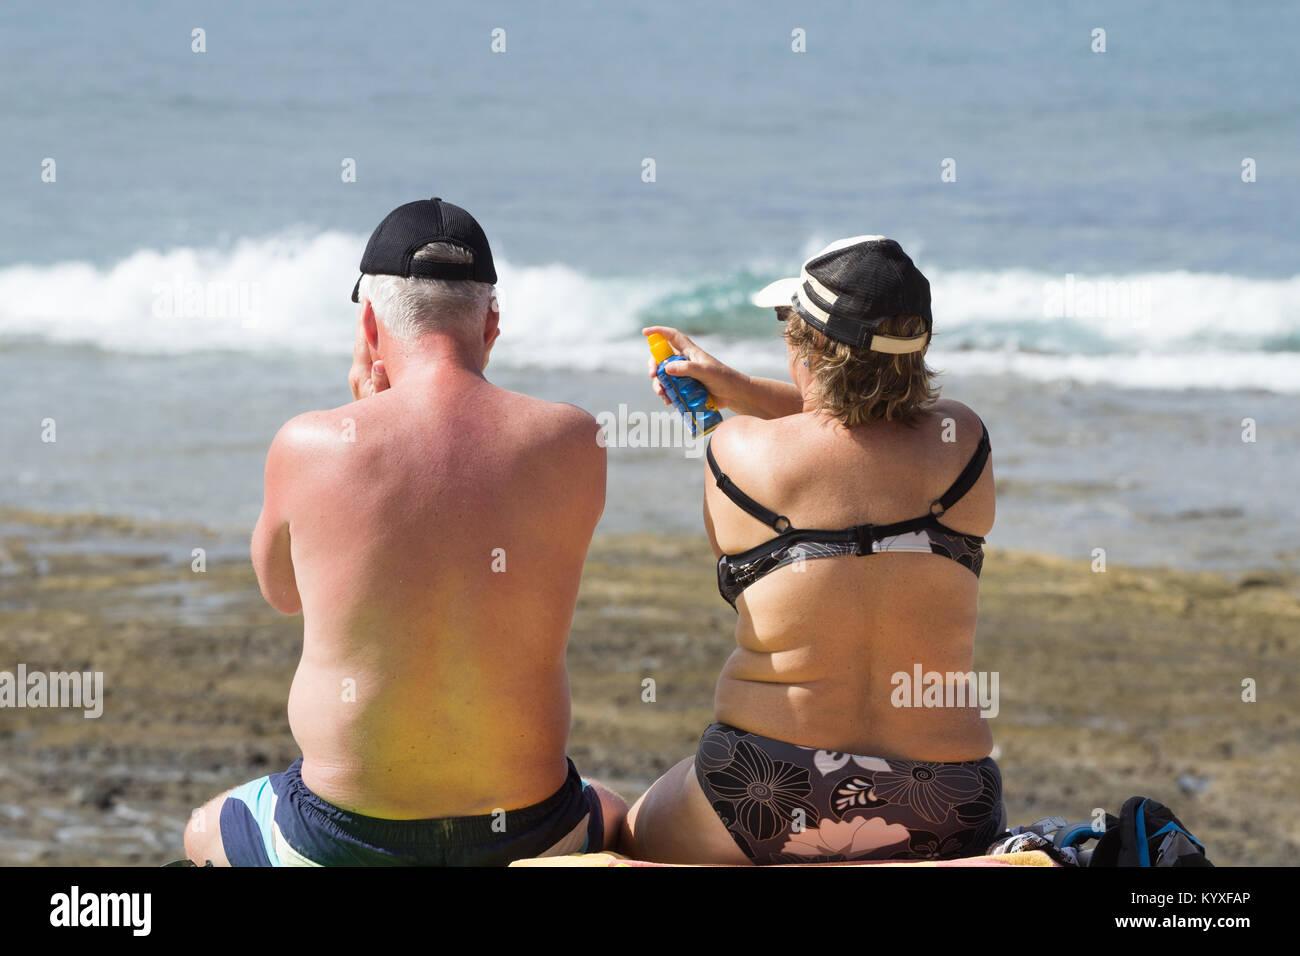 Brirs abroad: woman applying spray suncream to sunburnt back of man on beach in Spain. - Stock Image